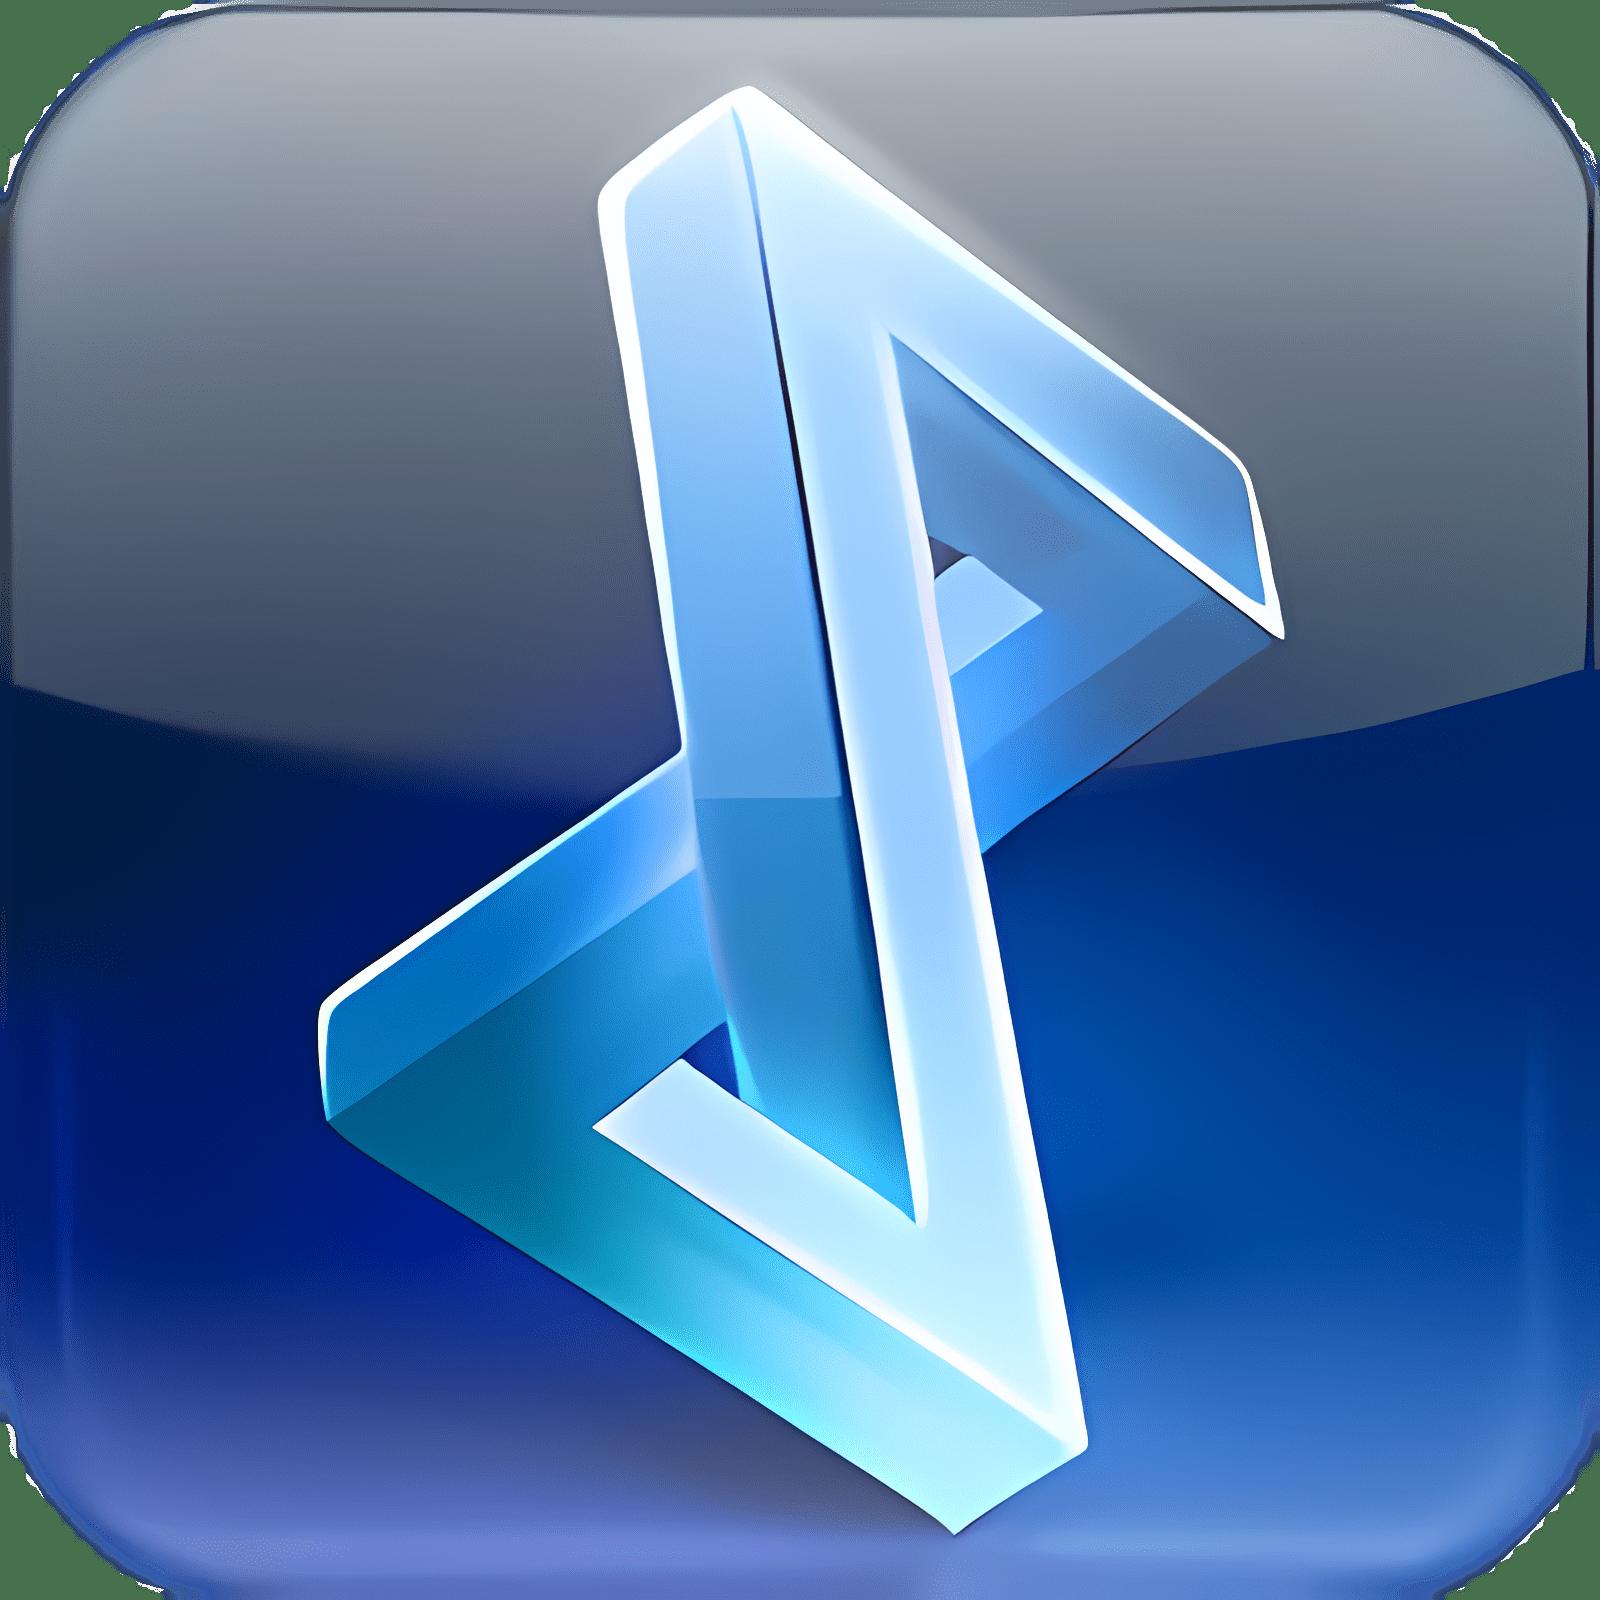 doubleTwist 3.0.0.6339 Beta